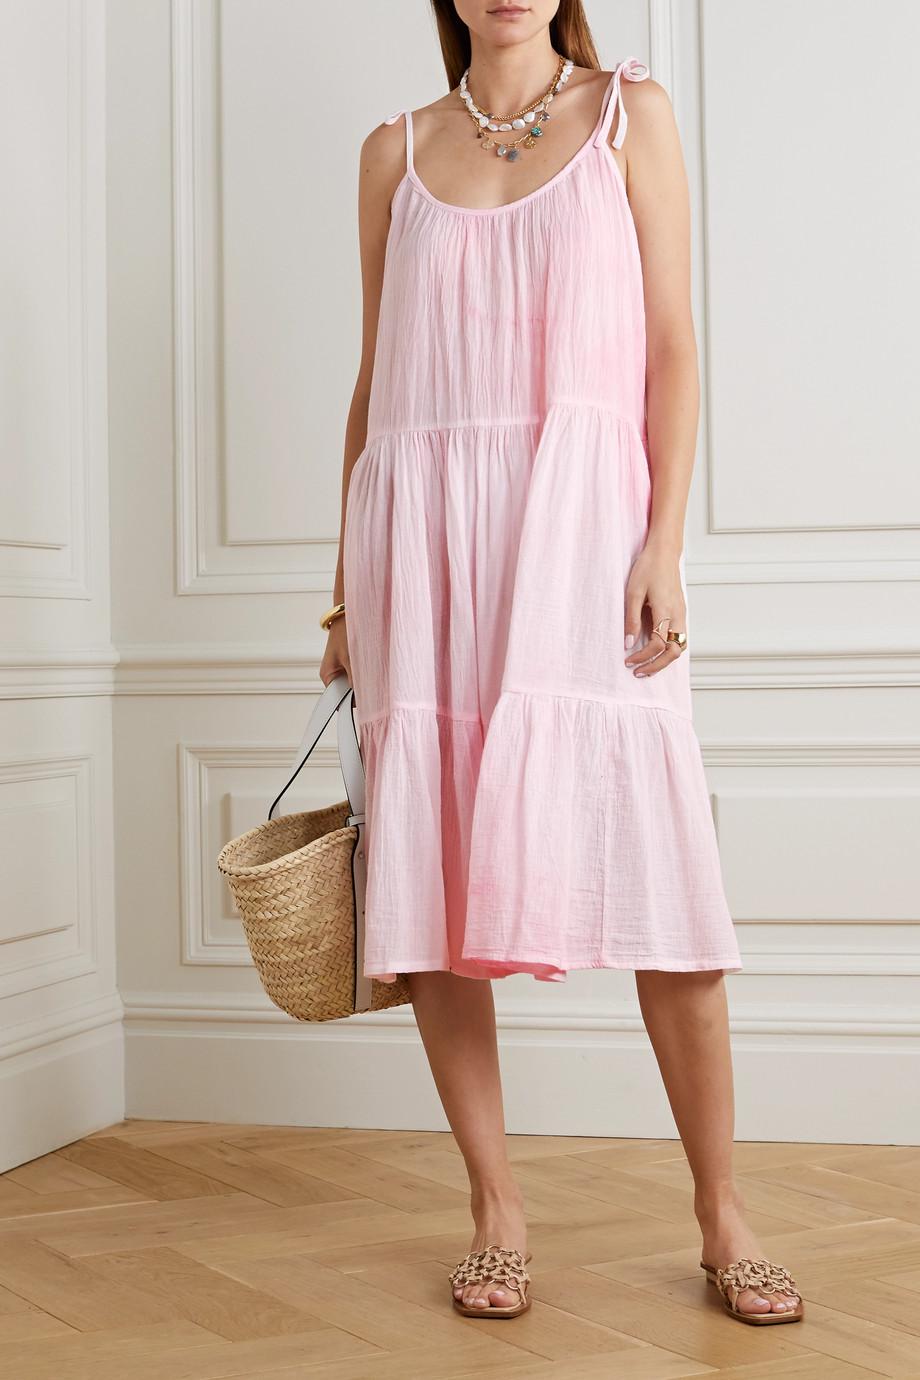 Honorine Daisy tie-dyed crinkled cotton-gauze dress